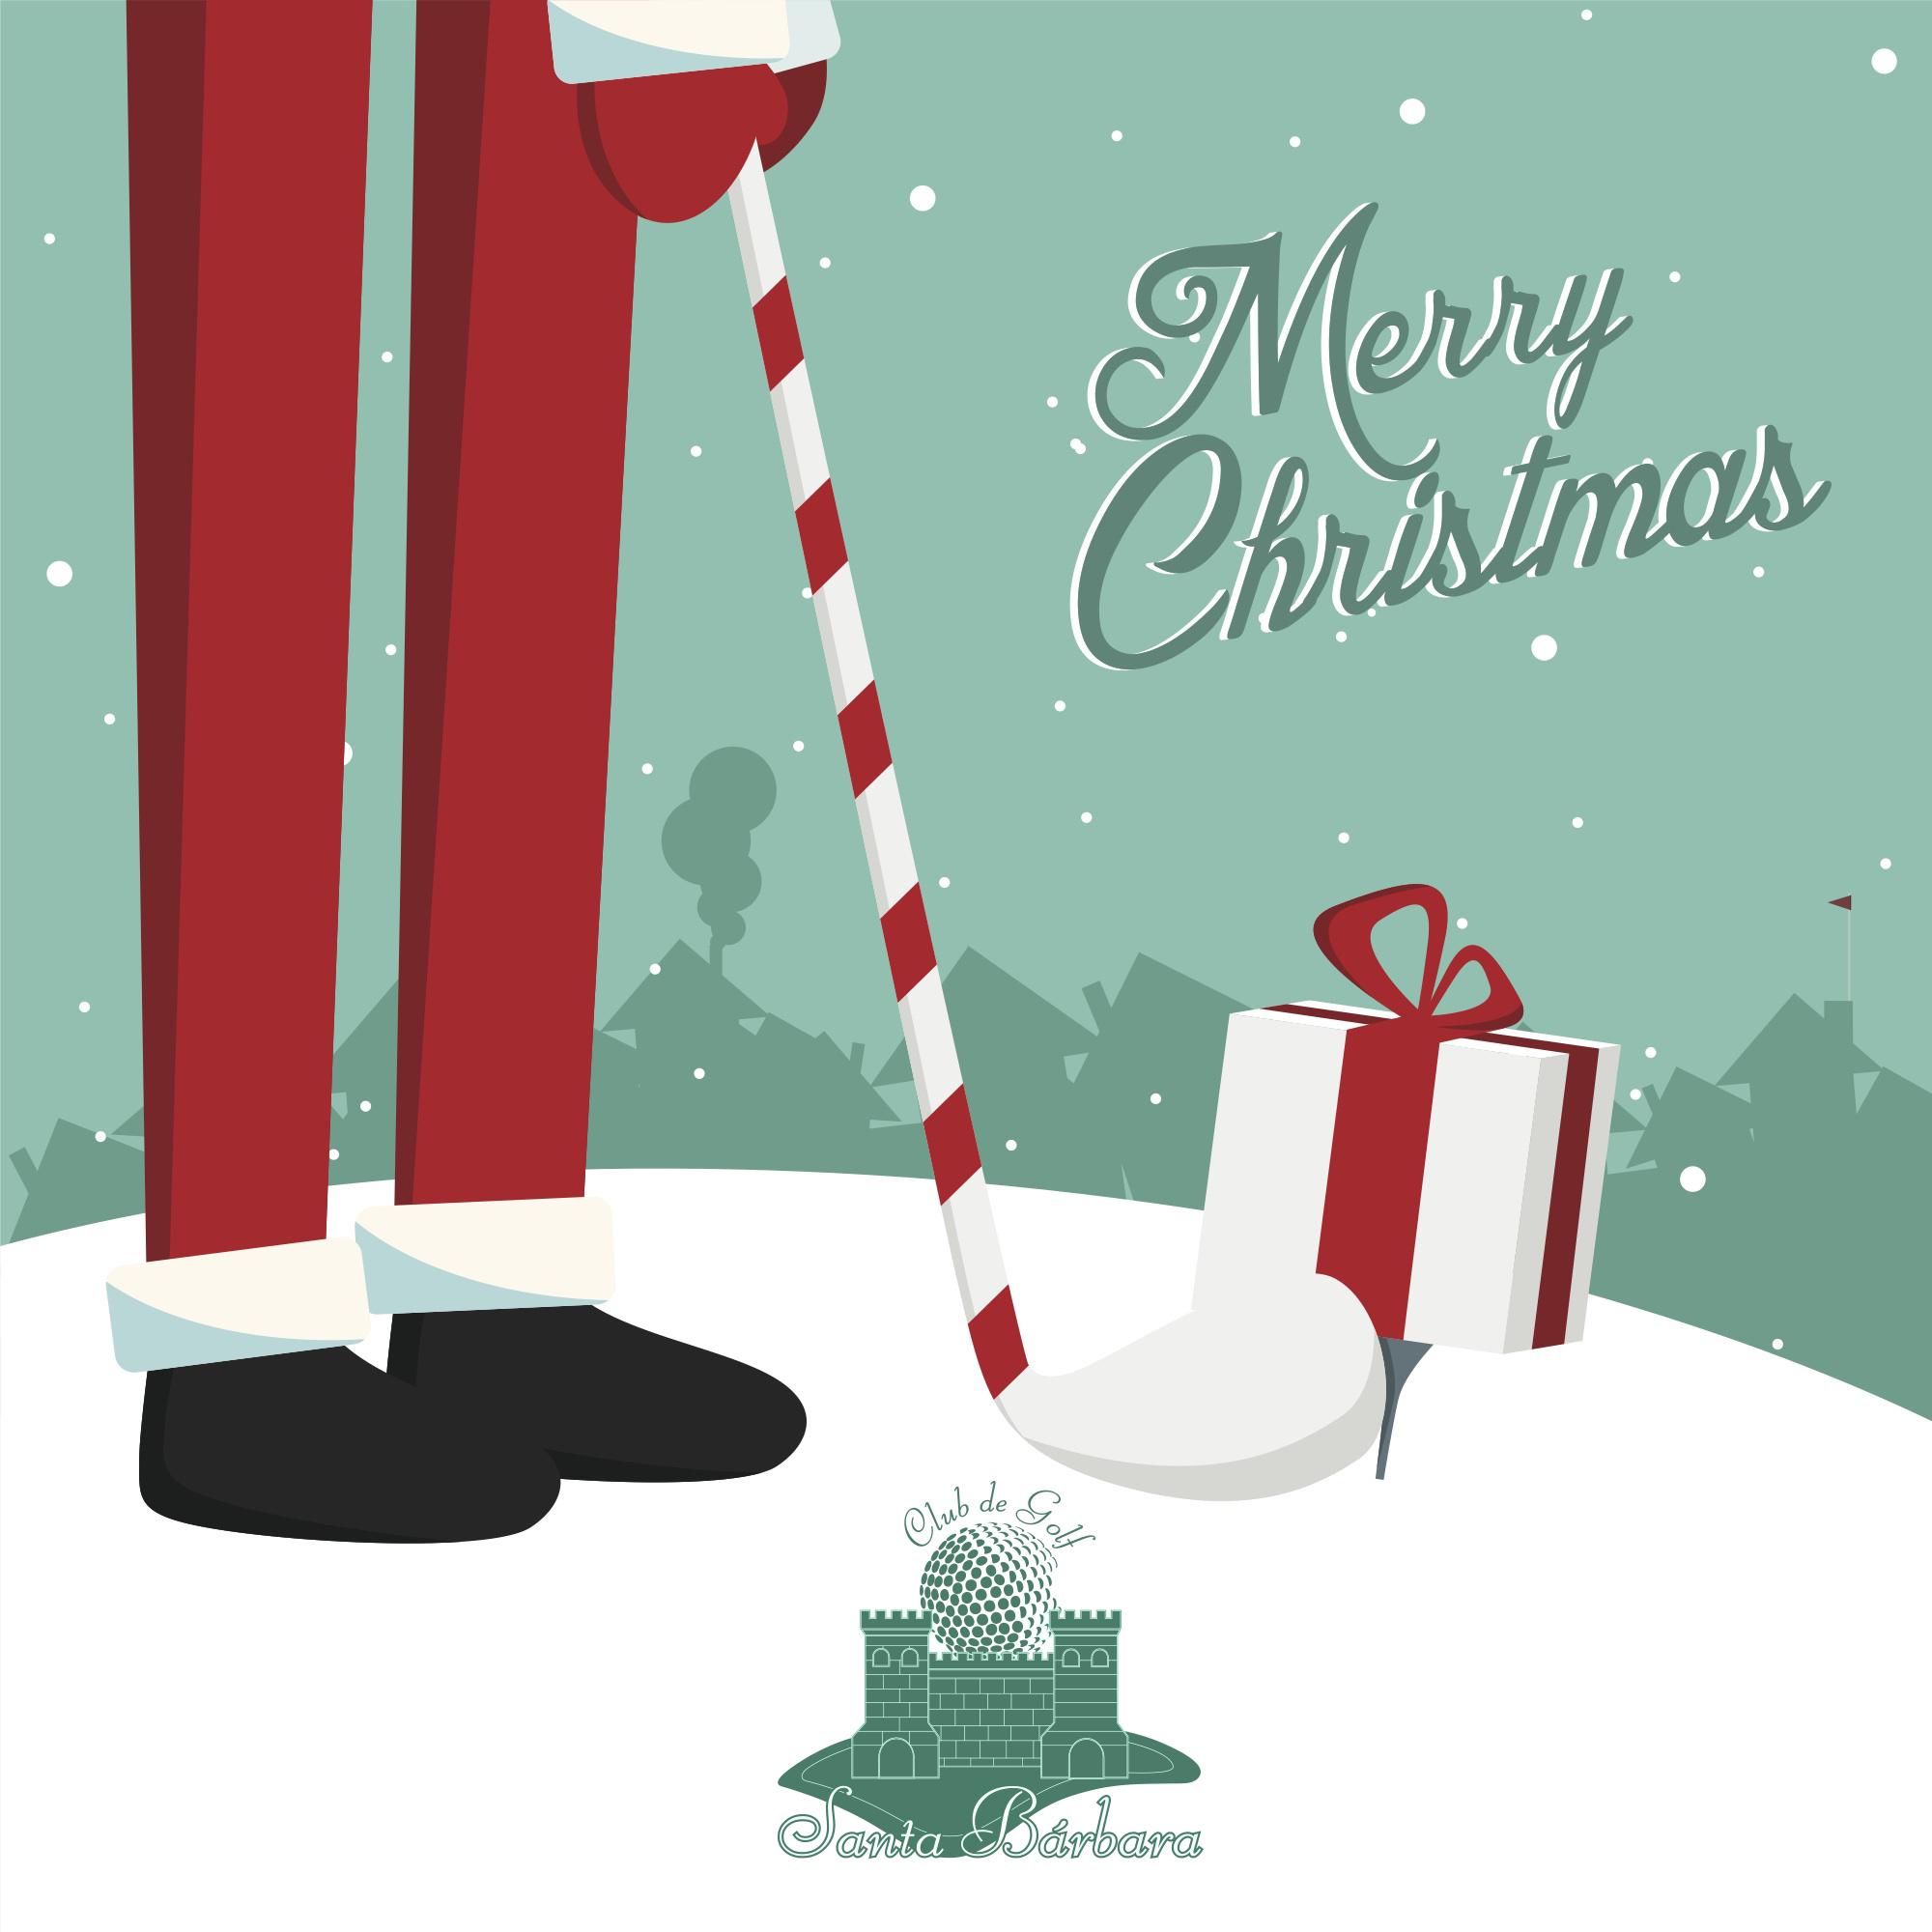 Merry_Christmas_Golf copia